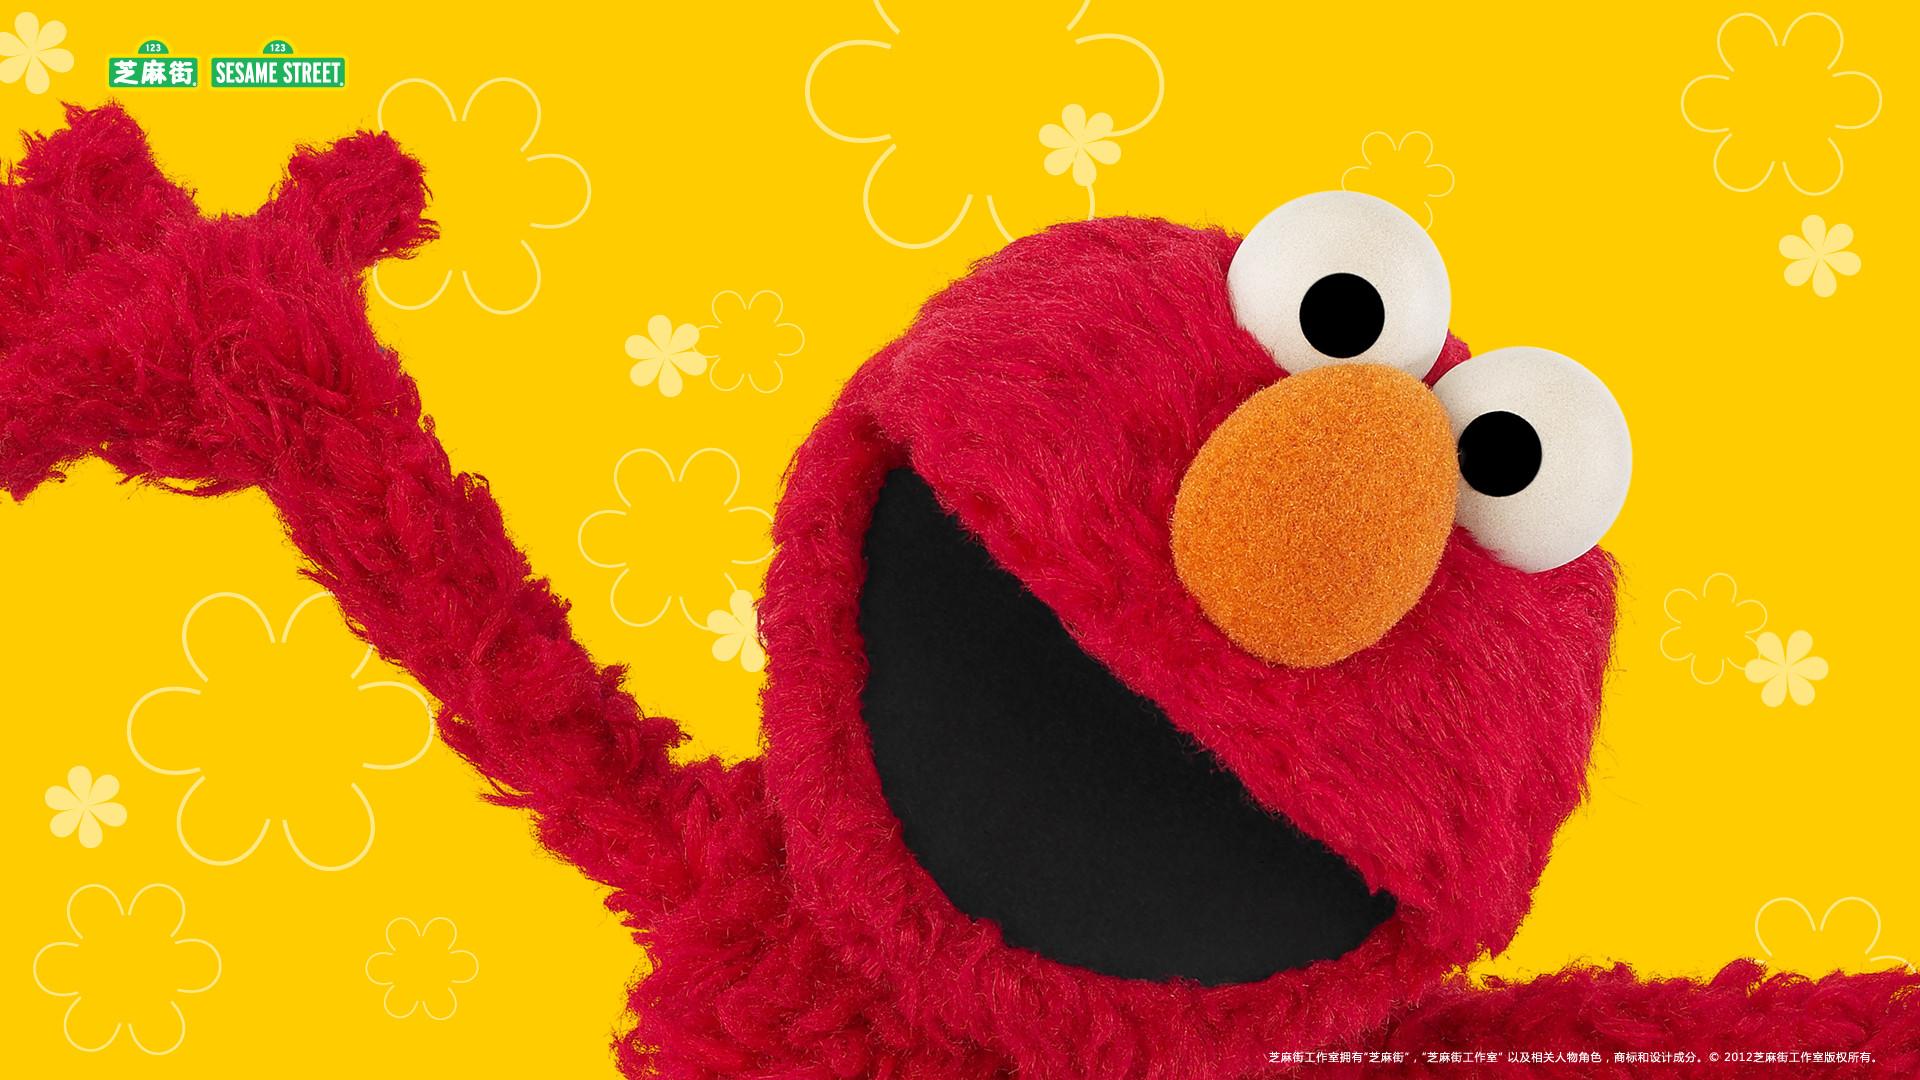 Bert Sesame Street Iphone X Wallpaper Elmo Wallpaper 56 Images